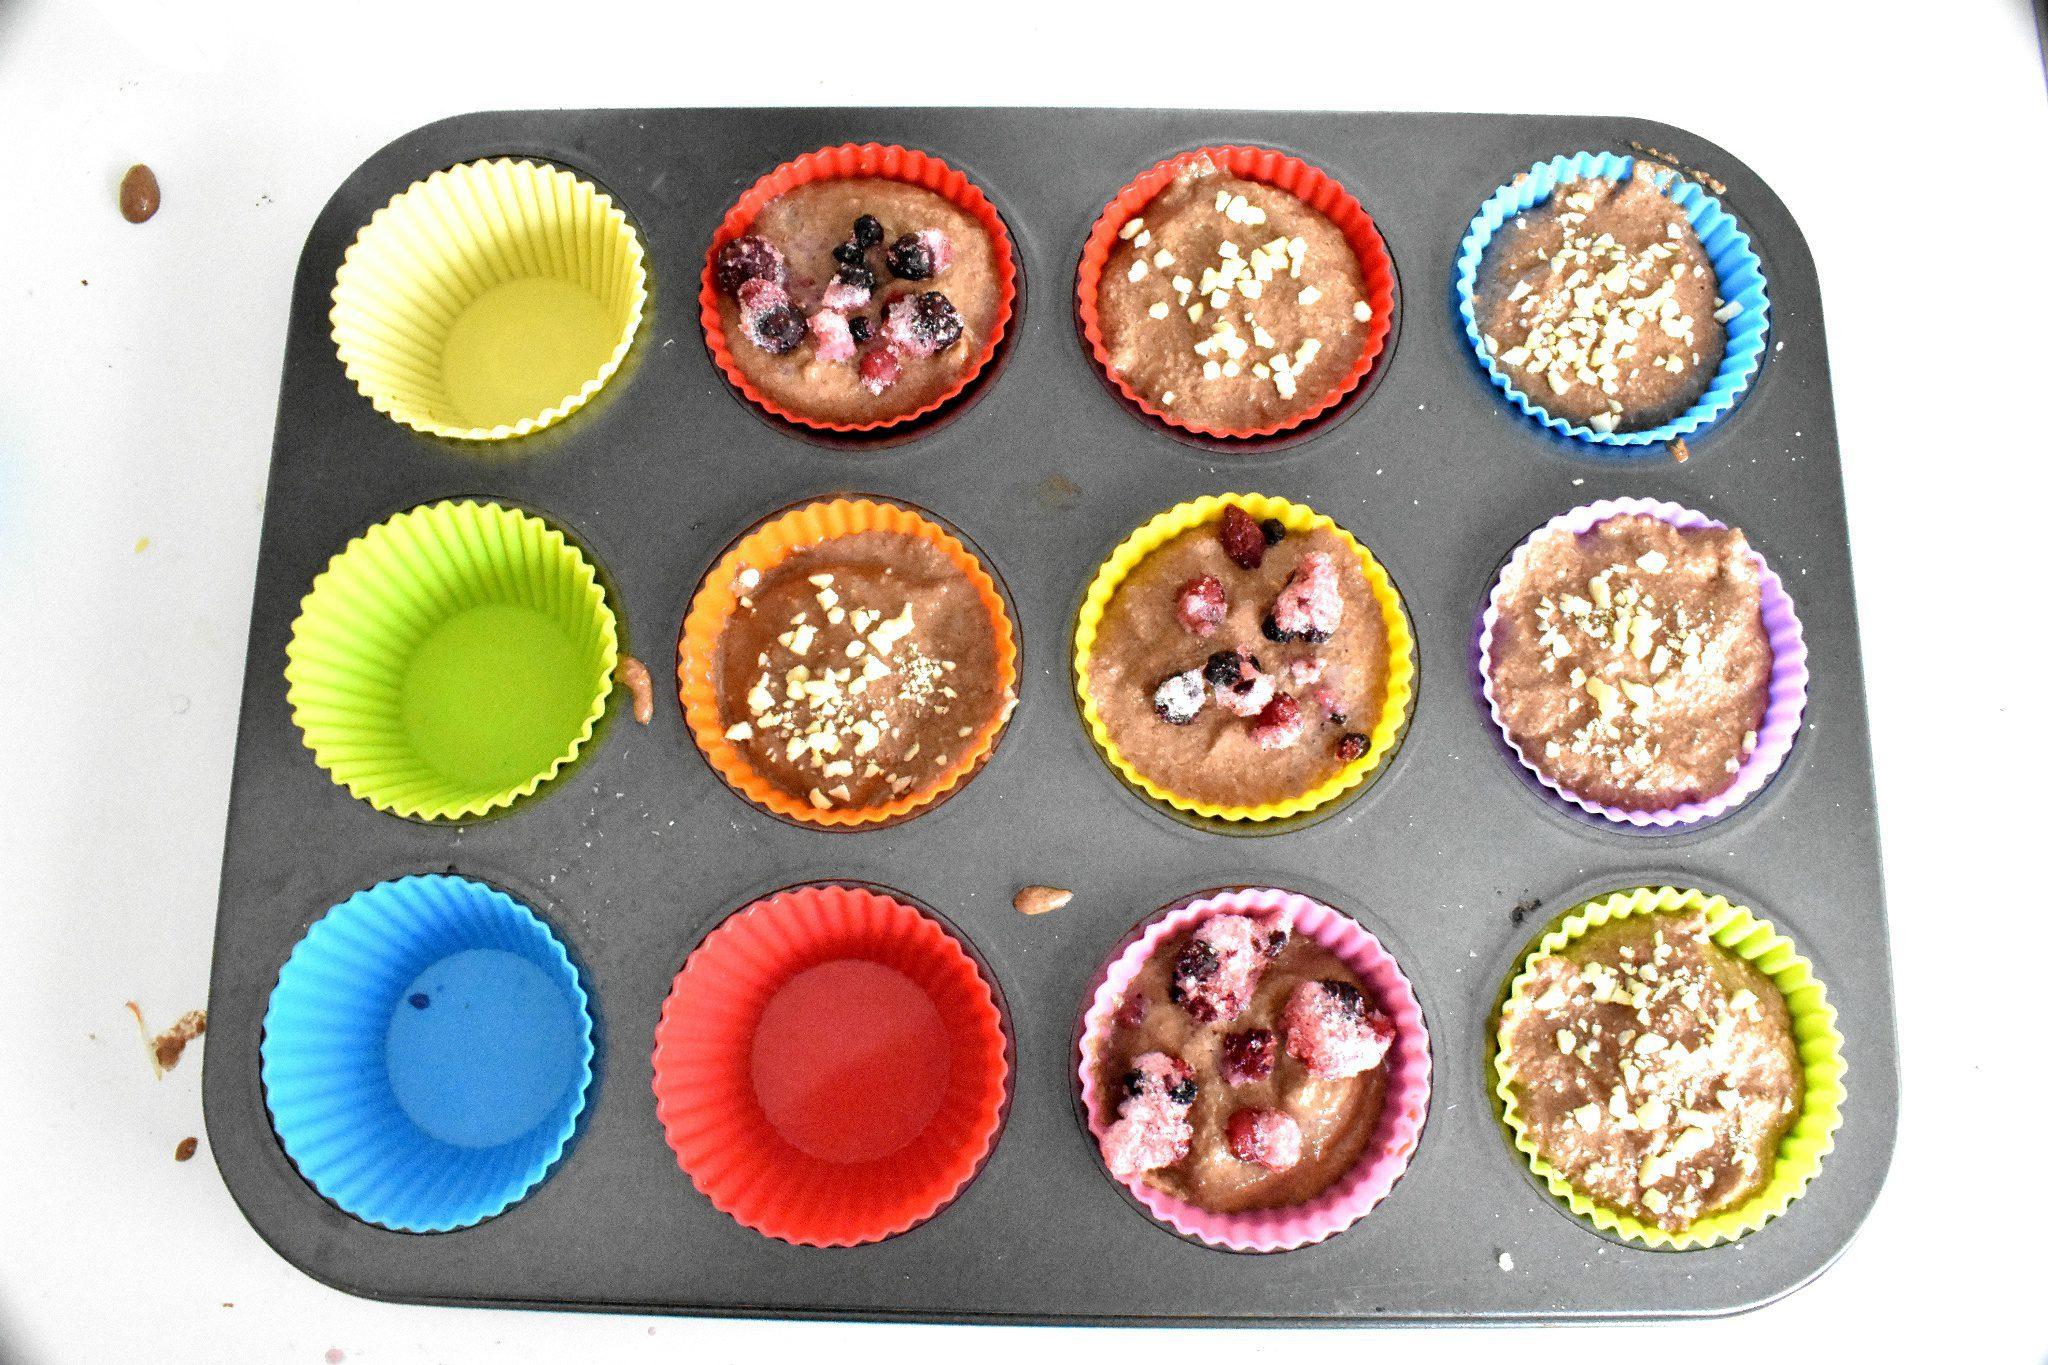 Muffin-gluten-free-chocolate-process-14-SunCakeMom